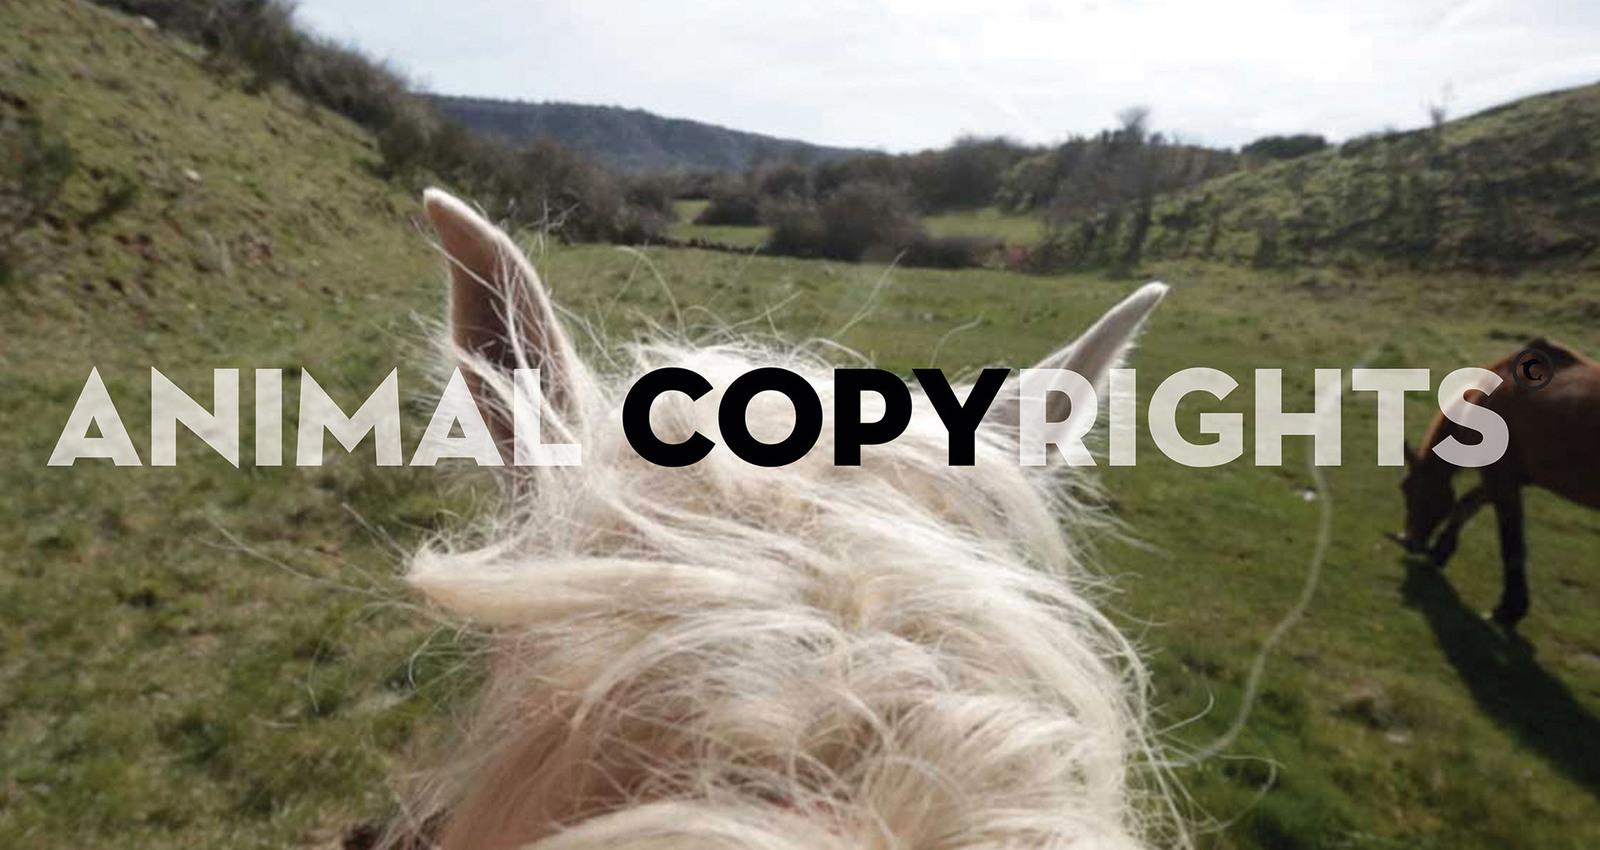 Animal Copyrights